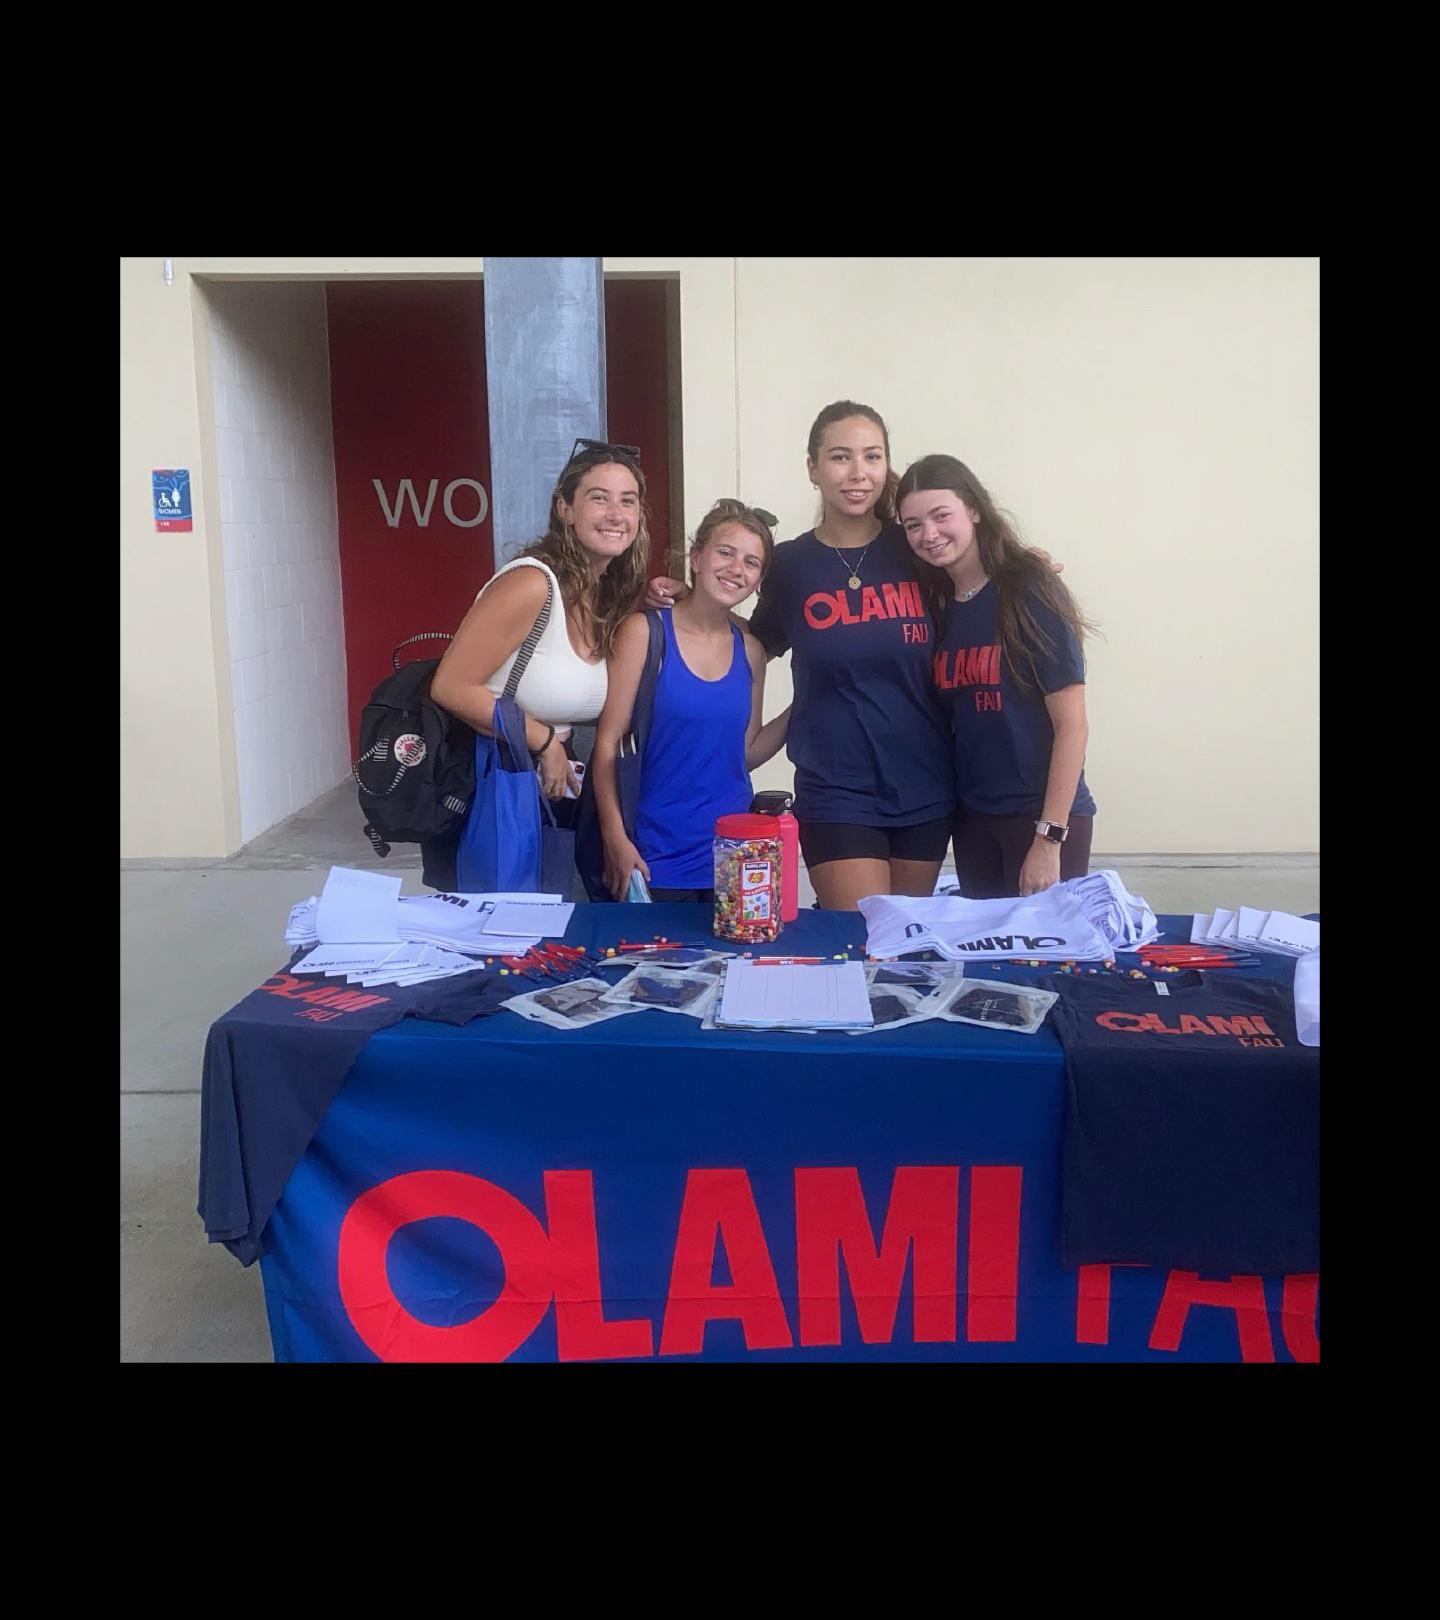 Olami-1-copy-8j